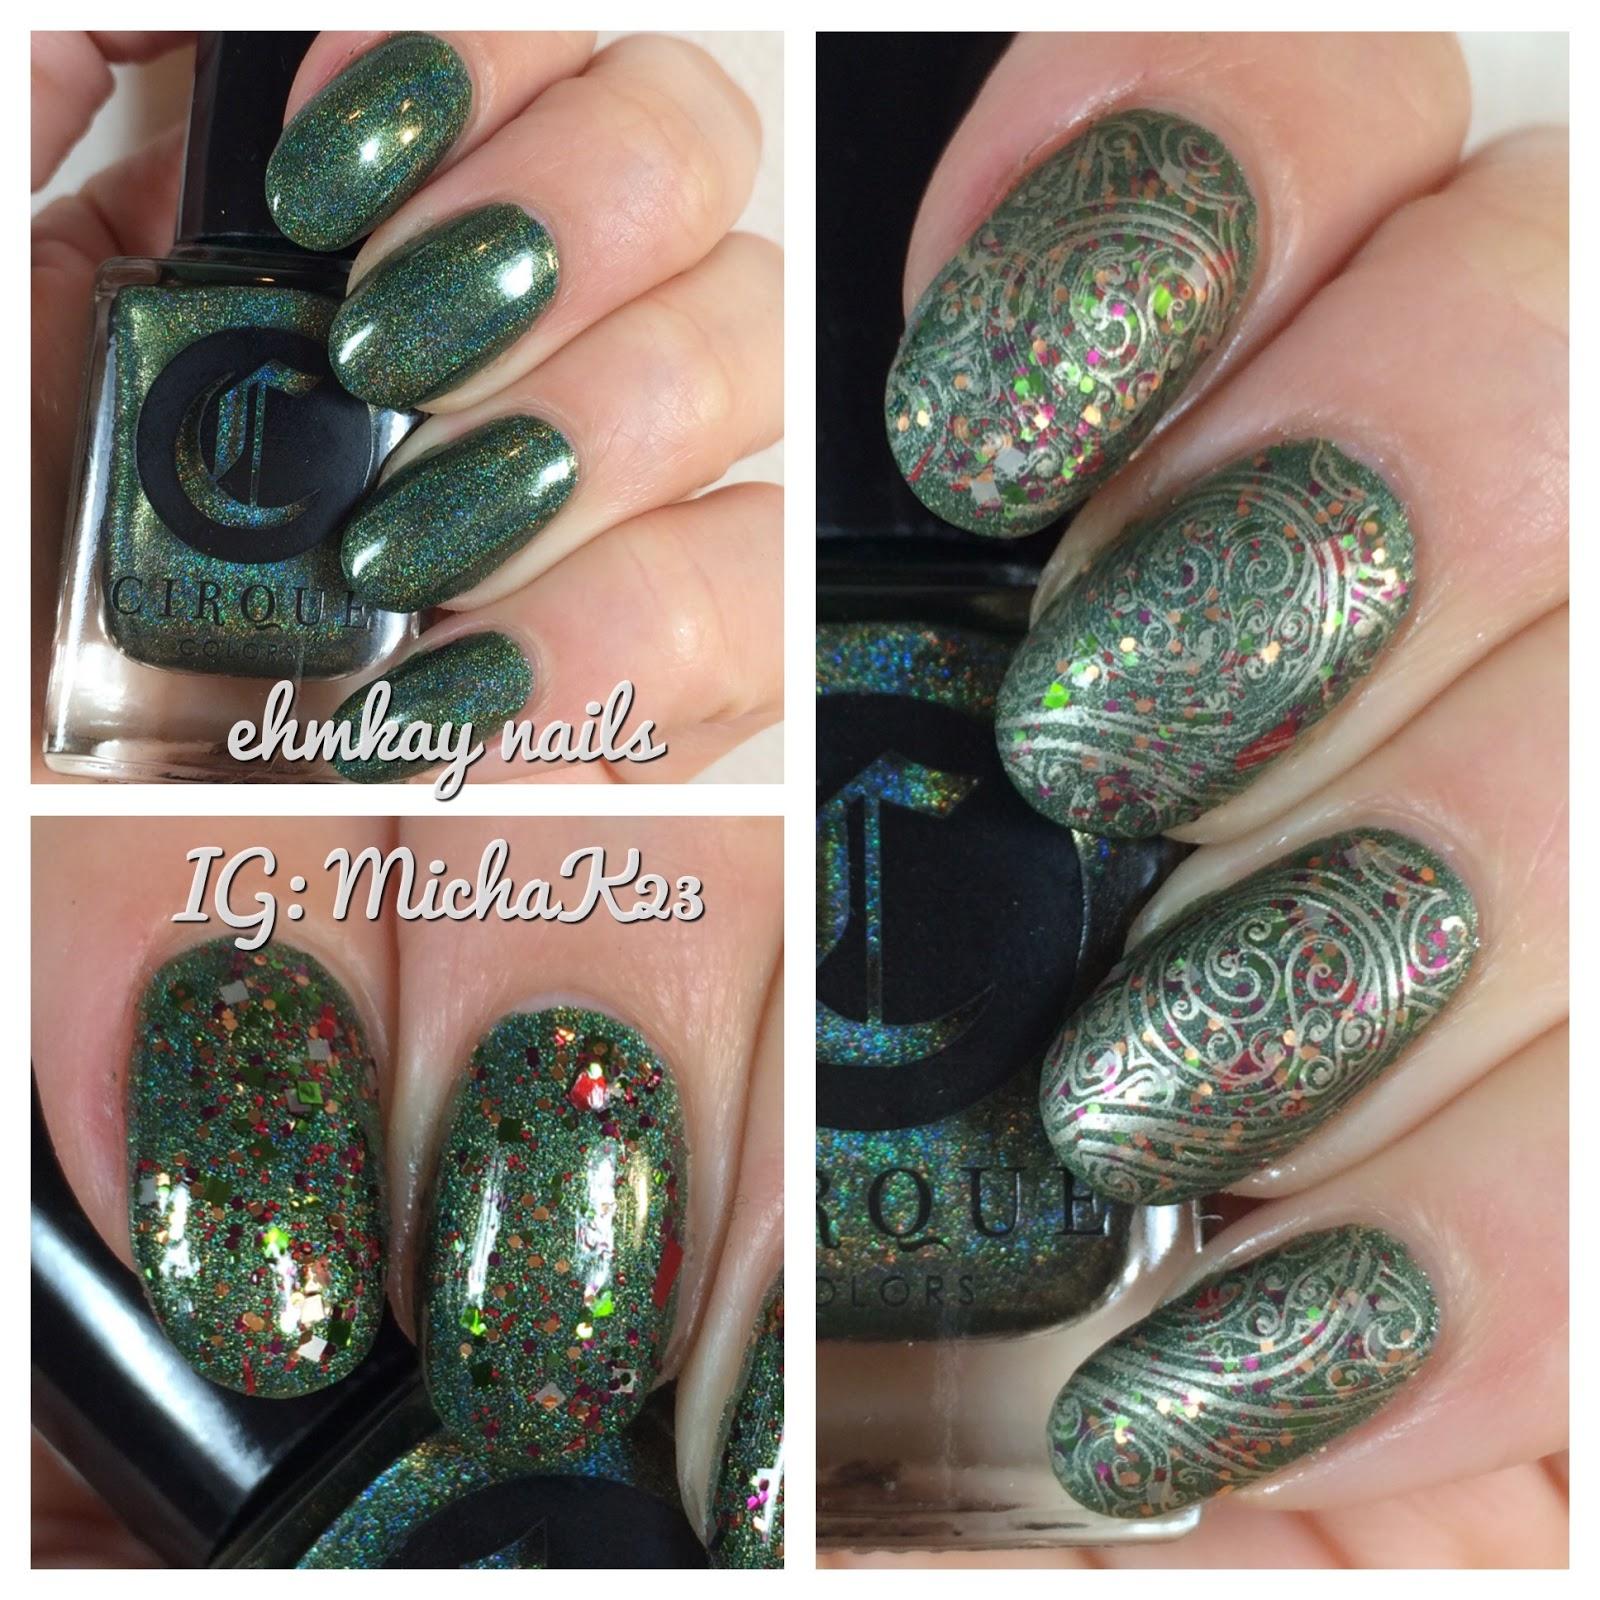 ehmkay nails: Victorian Christmas Nail Art Stamping with ...